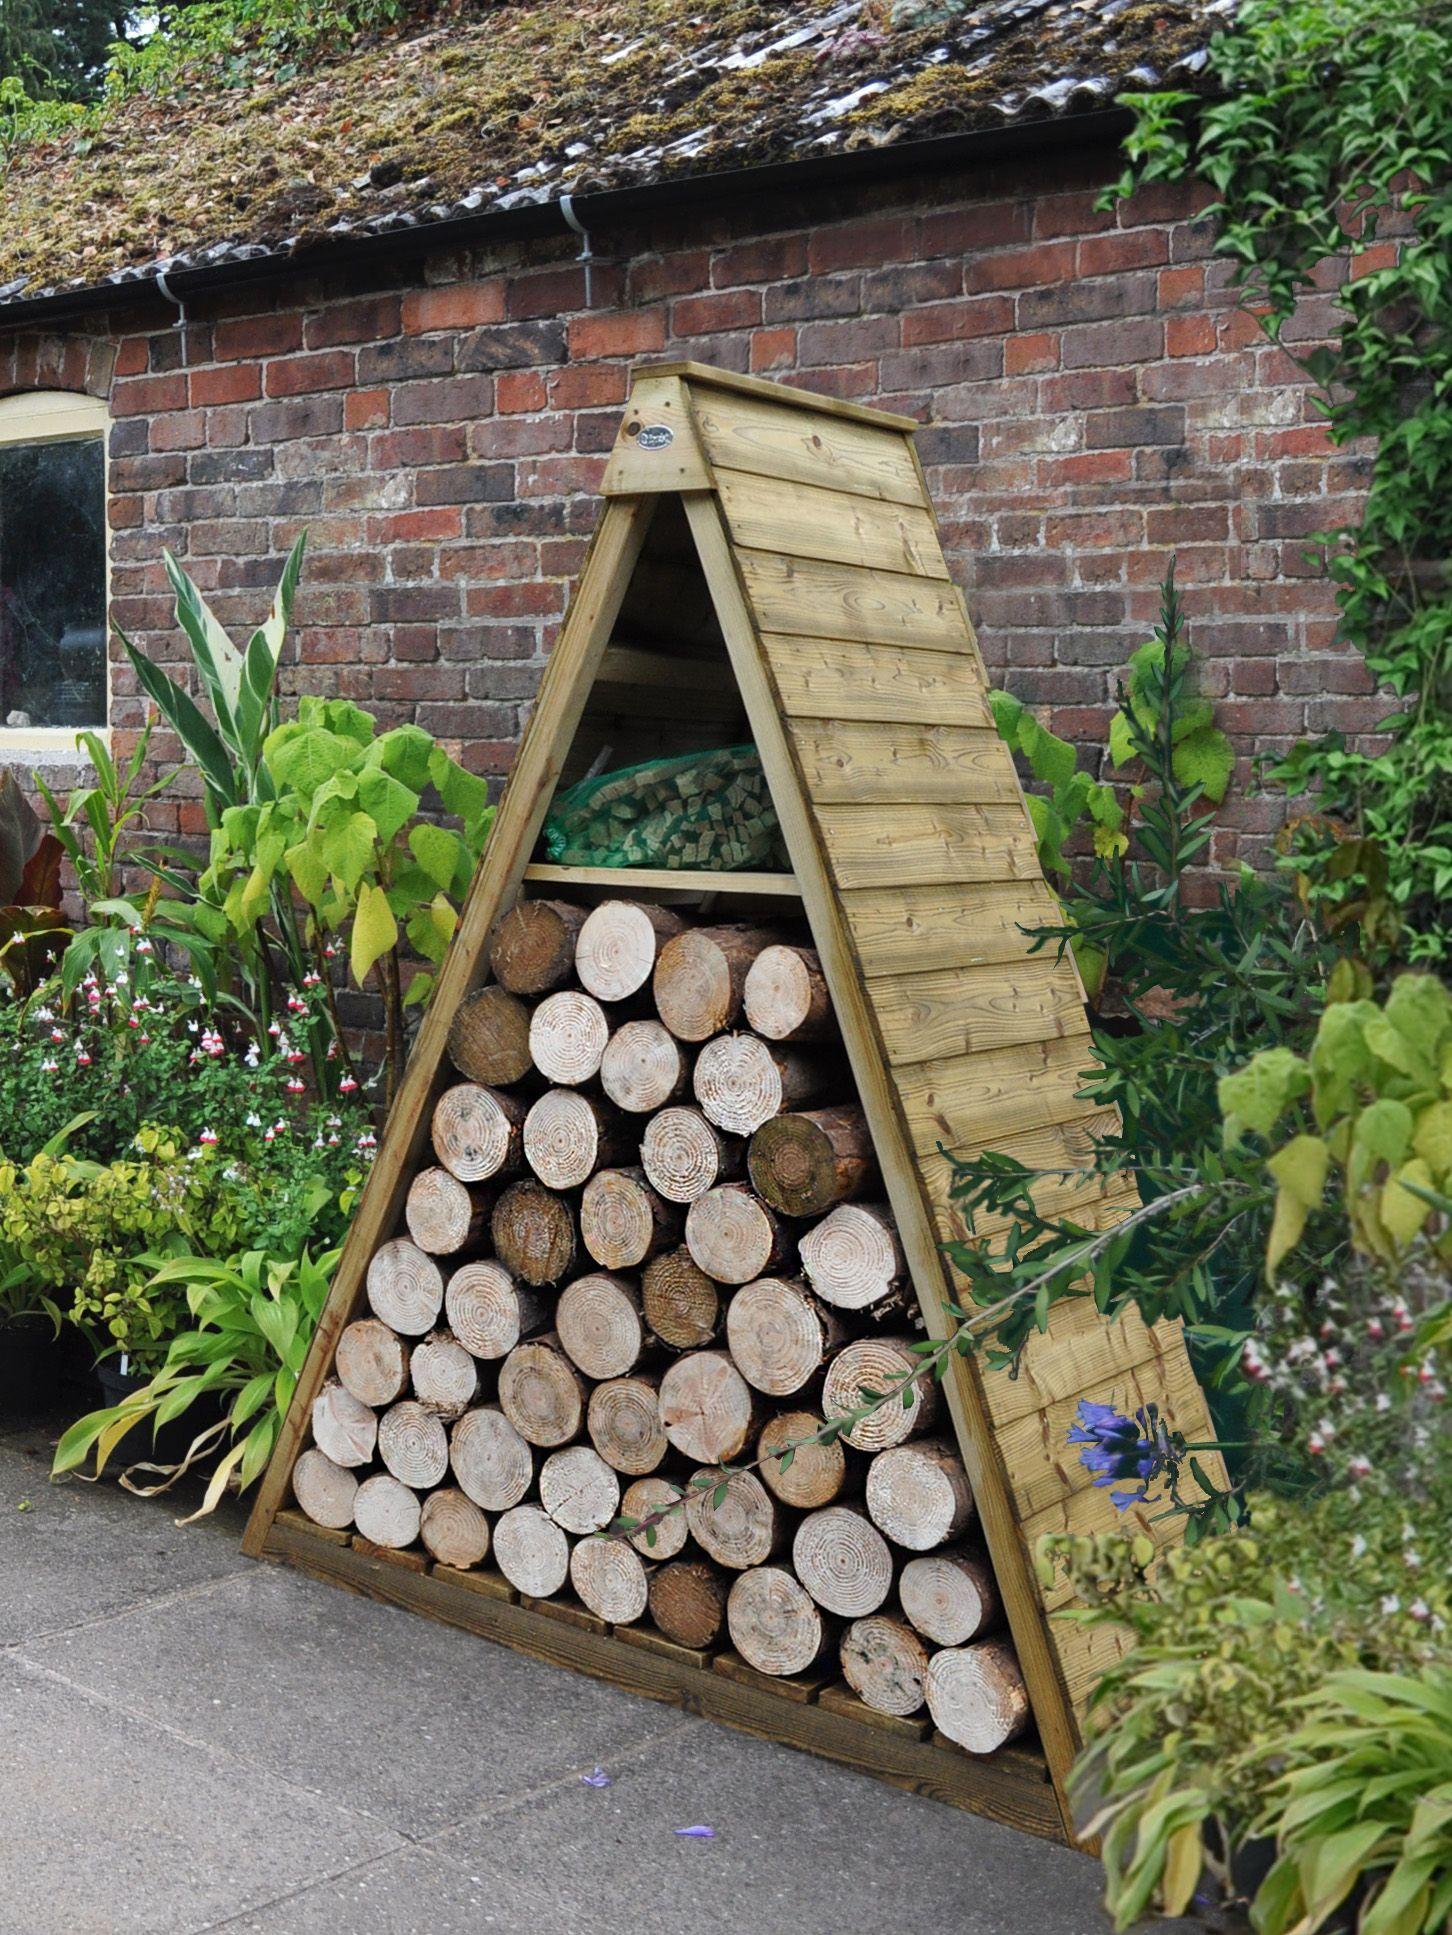 Log Store Shiplap Apex Wooden Log Store 5X2 | Woodsheds | Pinterest ...